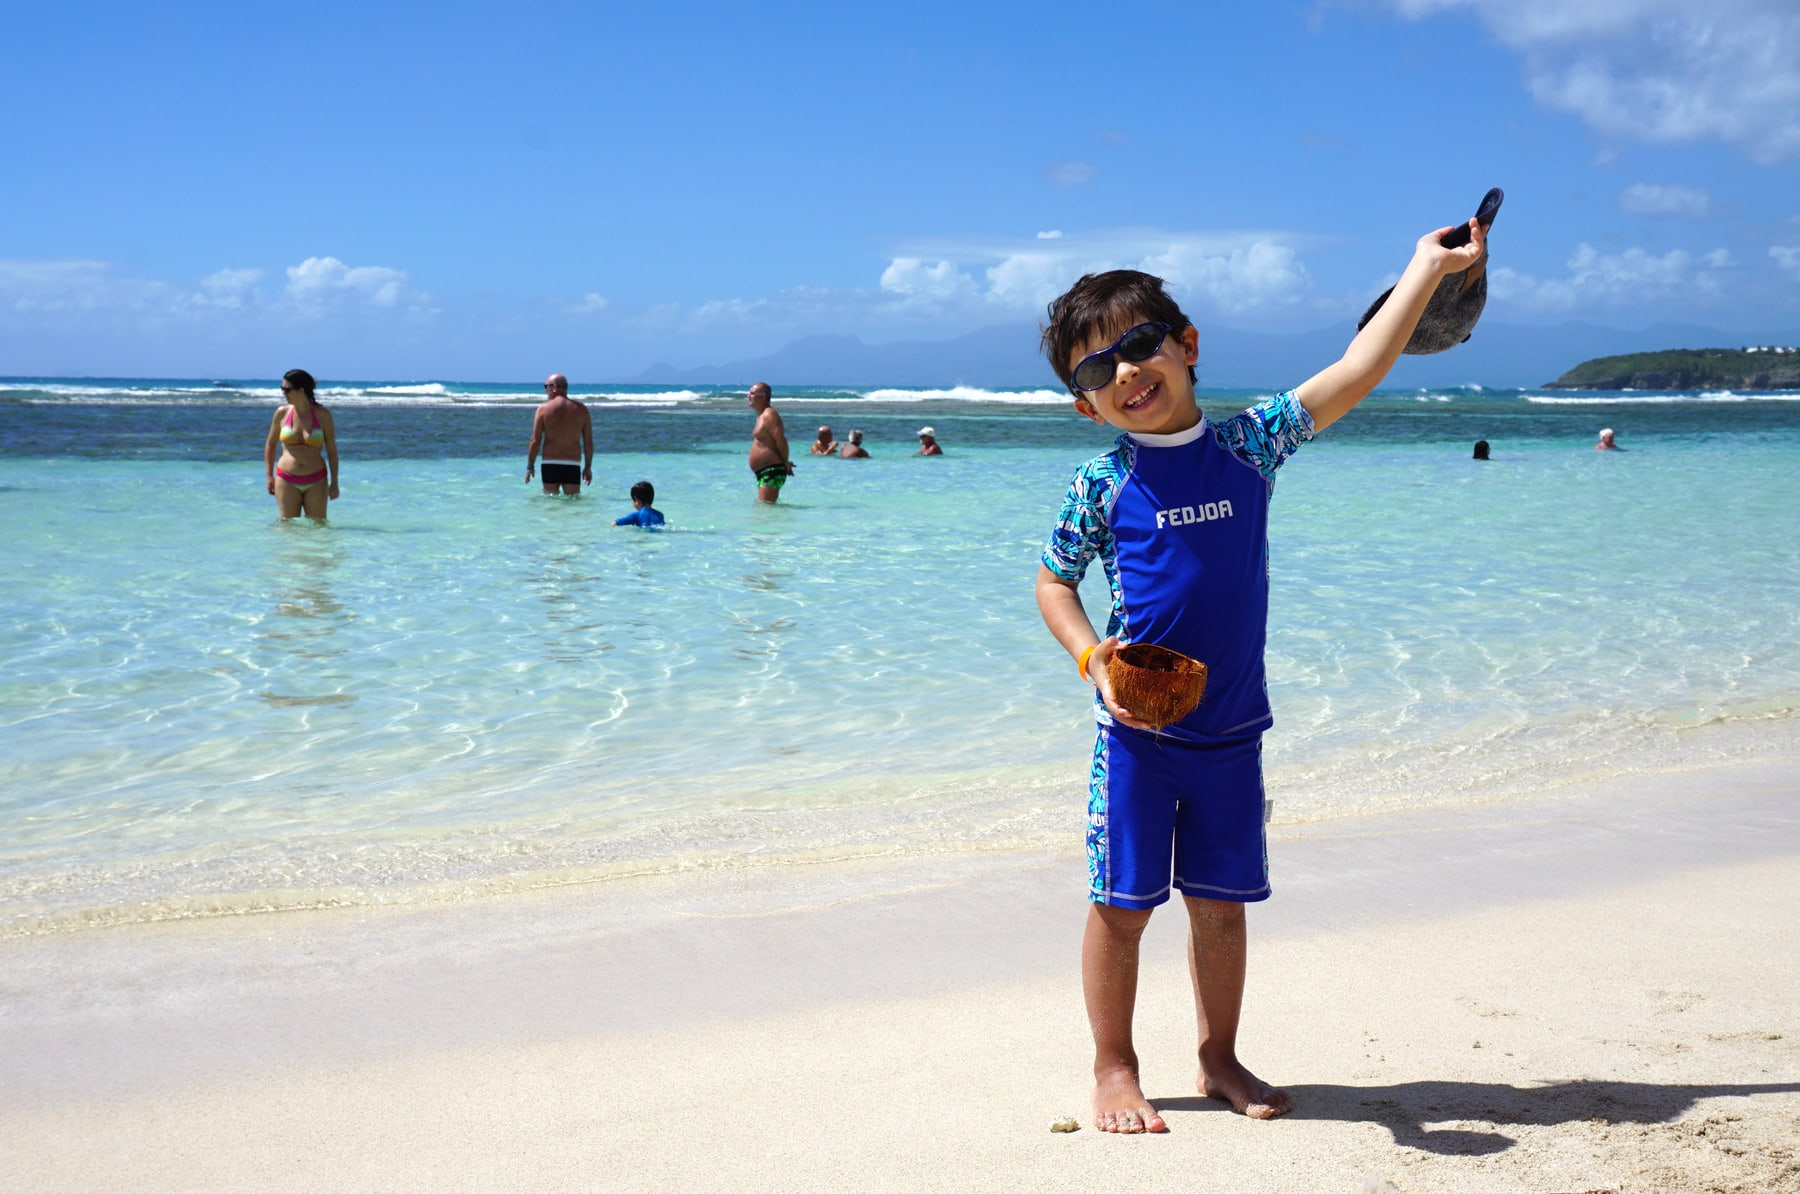 Guadeloupe plage caravelle baignade enfant